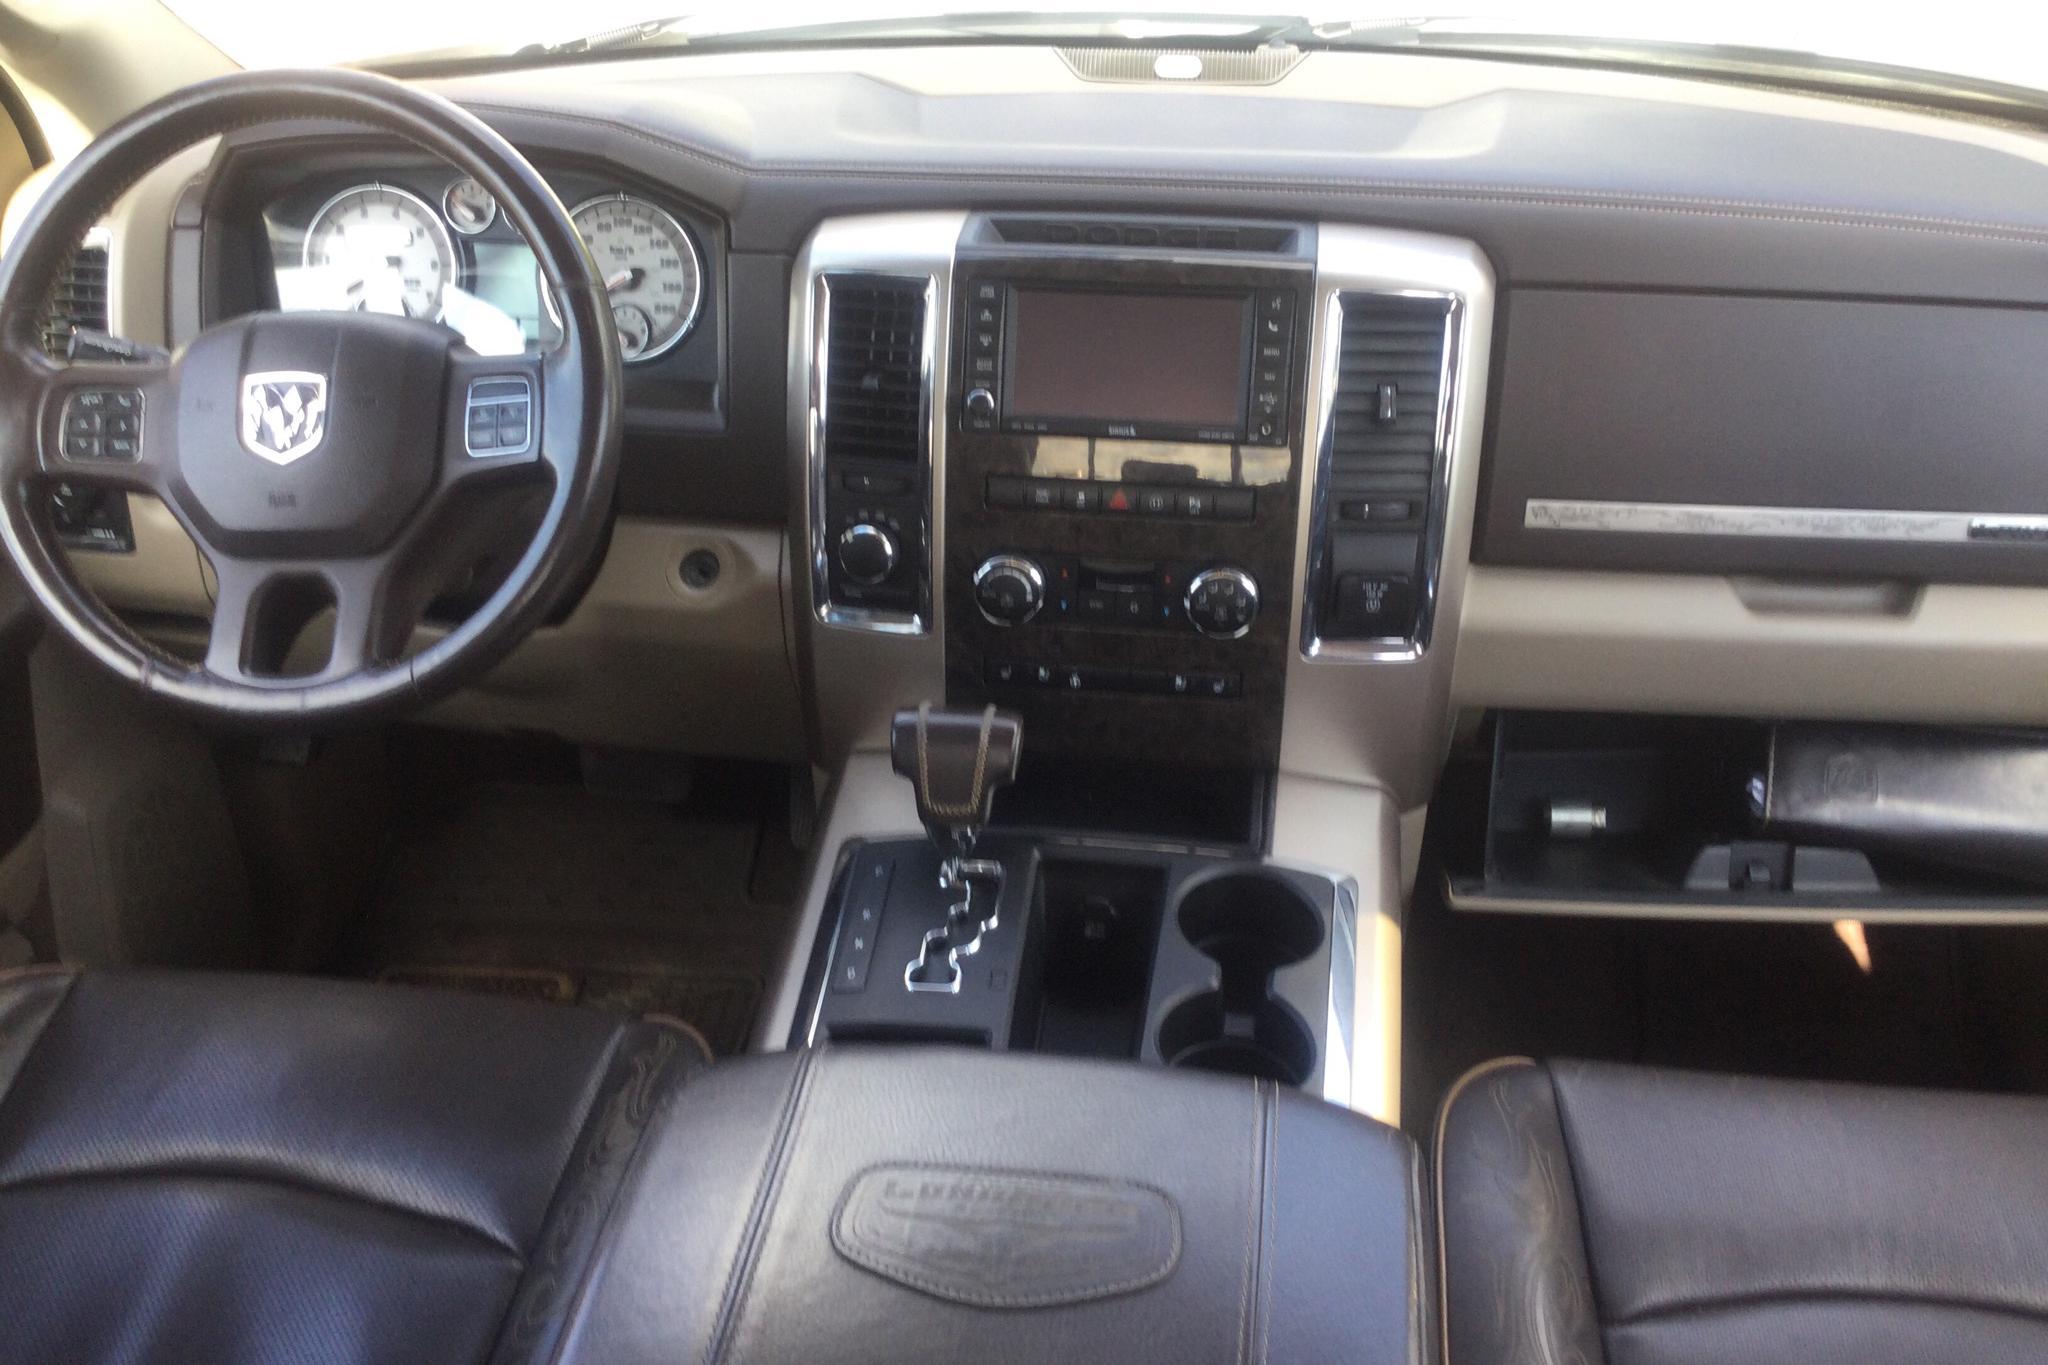 Dodge RAM 1500 5.7 (390hk) - 160 430 km - Automatic - white - 2012